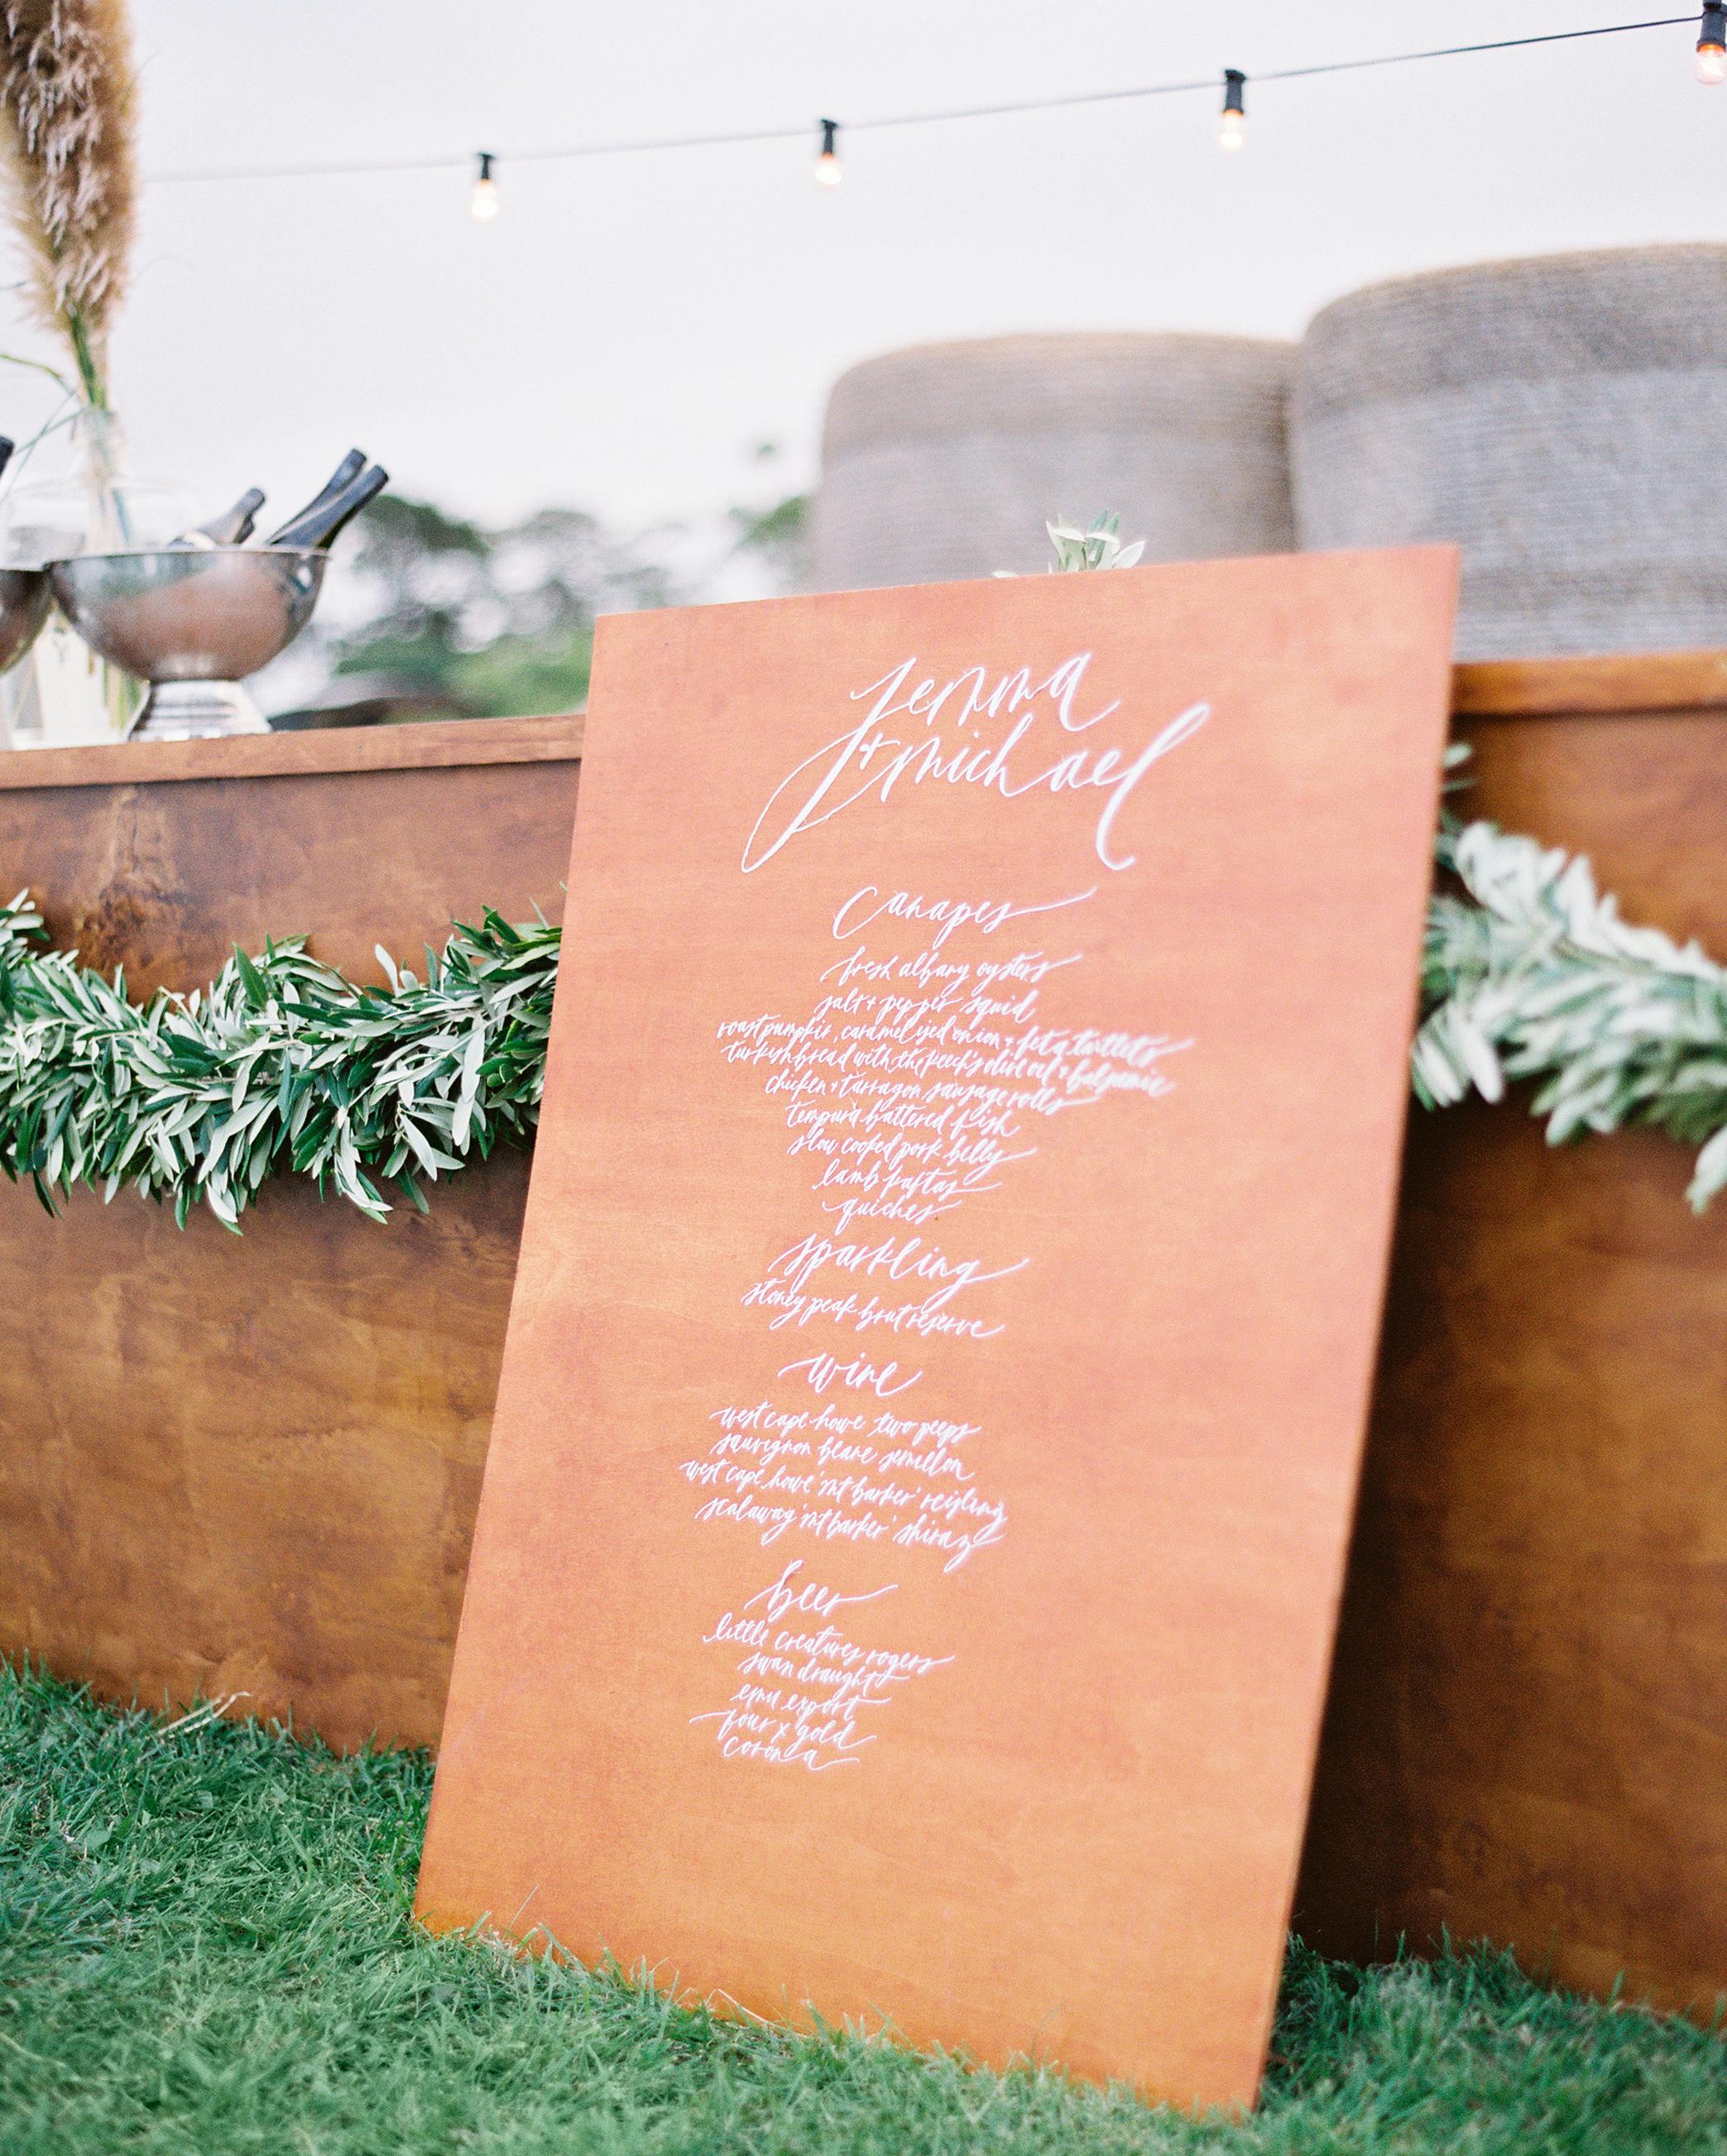 jemma-michael-wedding-menu-002586015-s112110-0815.jpg